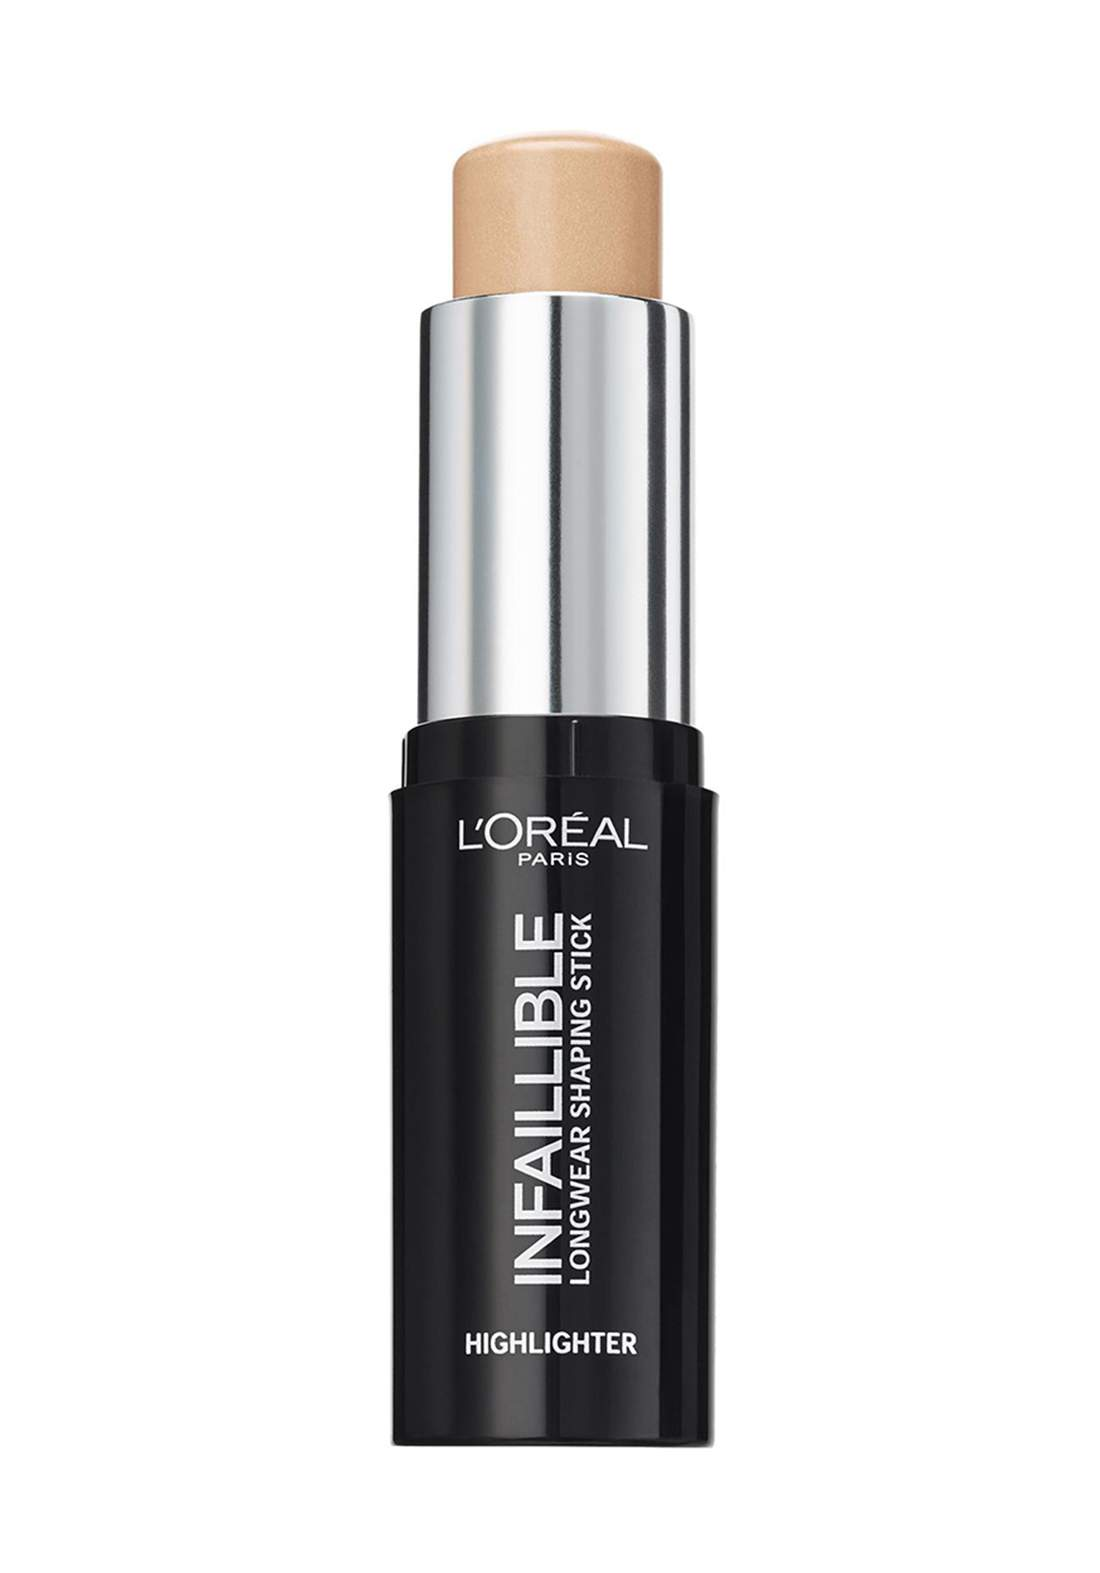 L'Oreal Paris Infallible Stobe Highlight Stick 502 Gold is cold (027-1061) اضاءة كريمية للوجه